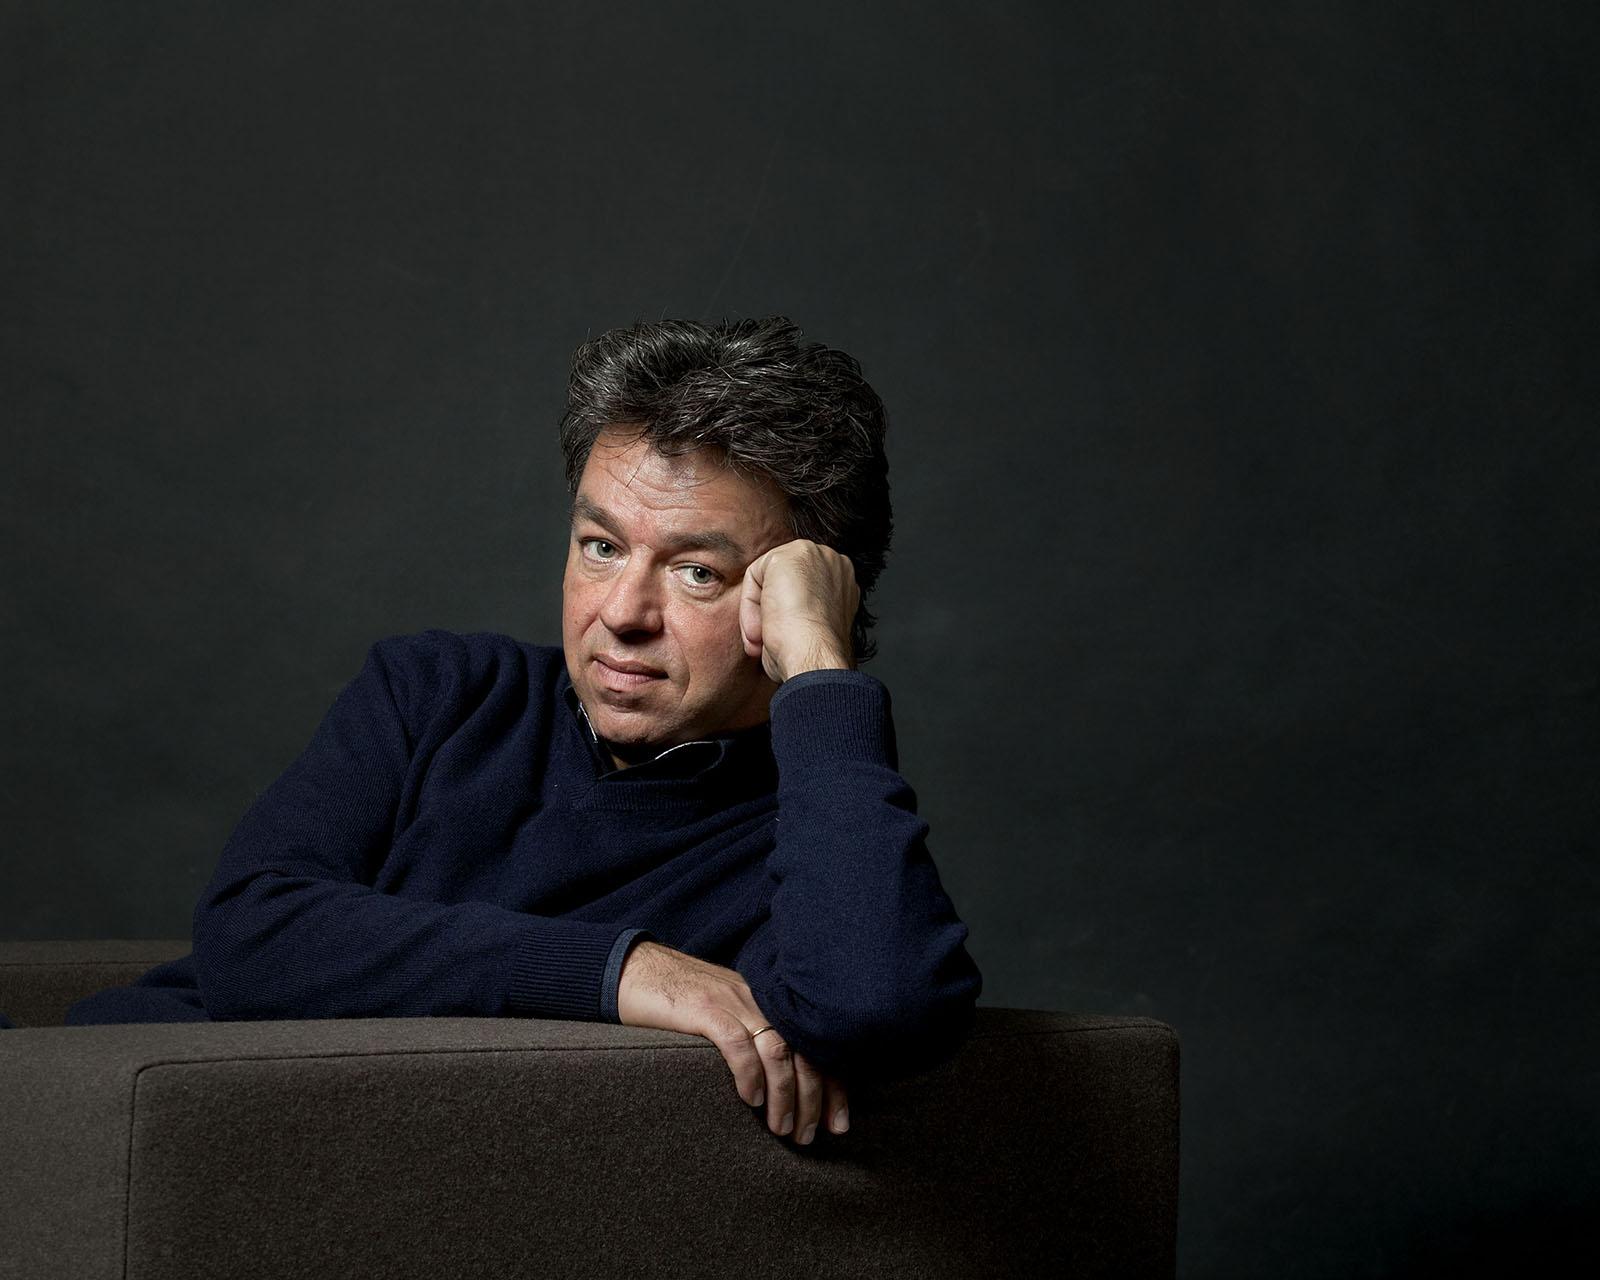 Yves Gijrath